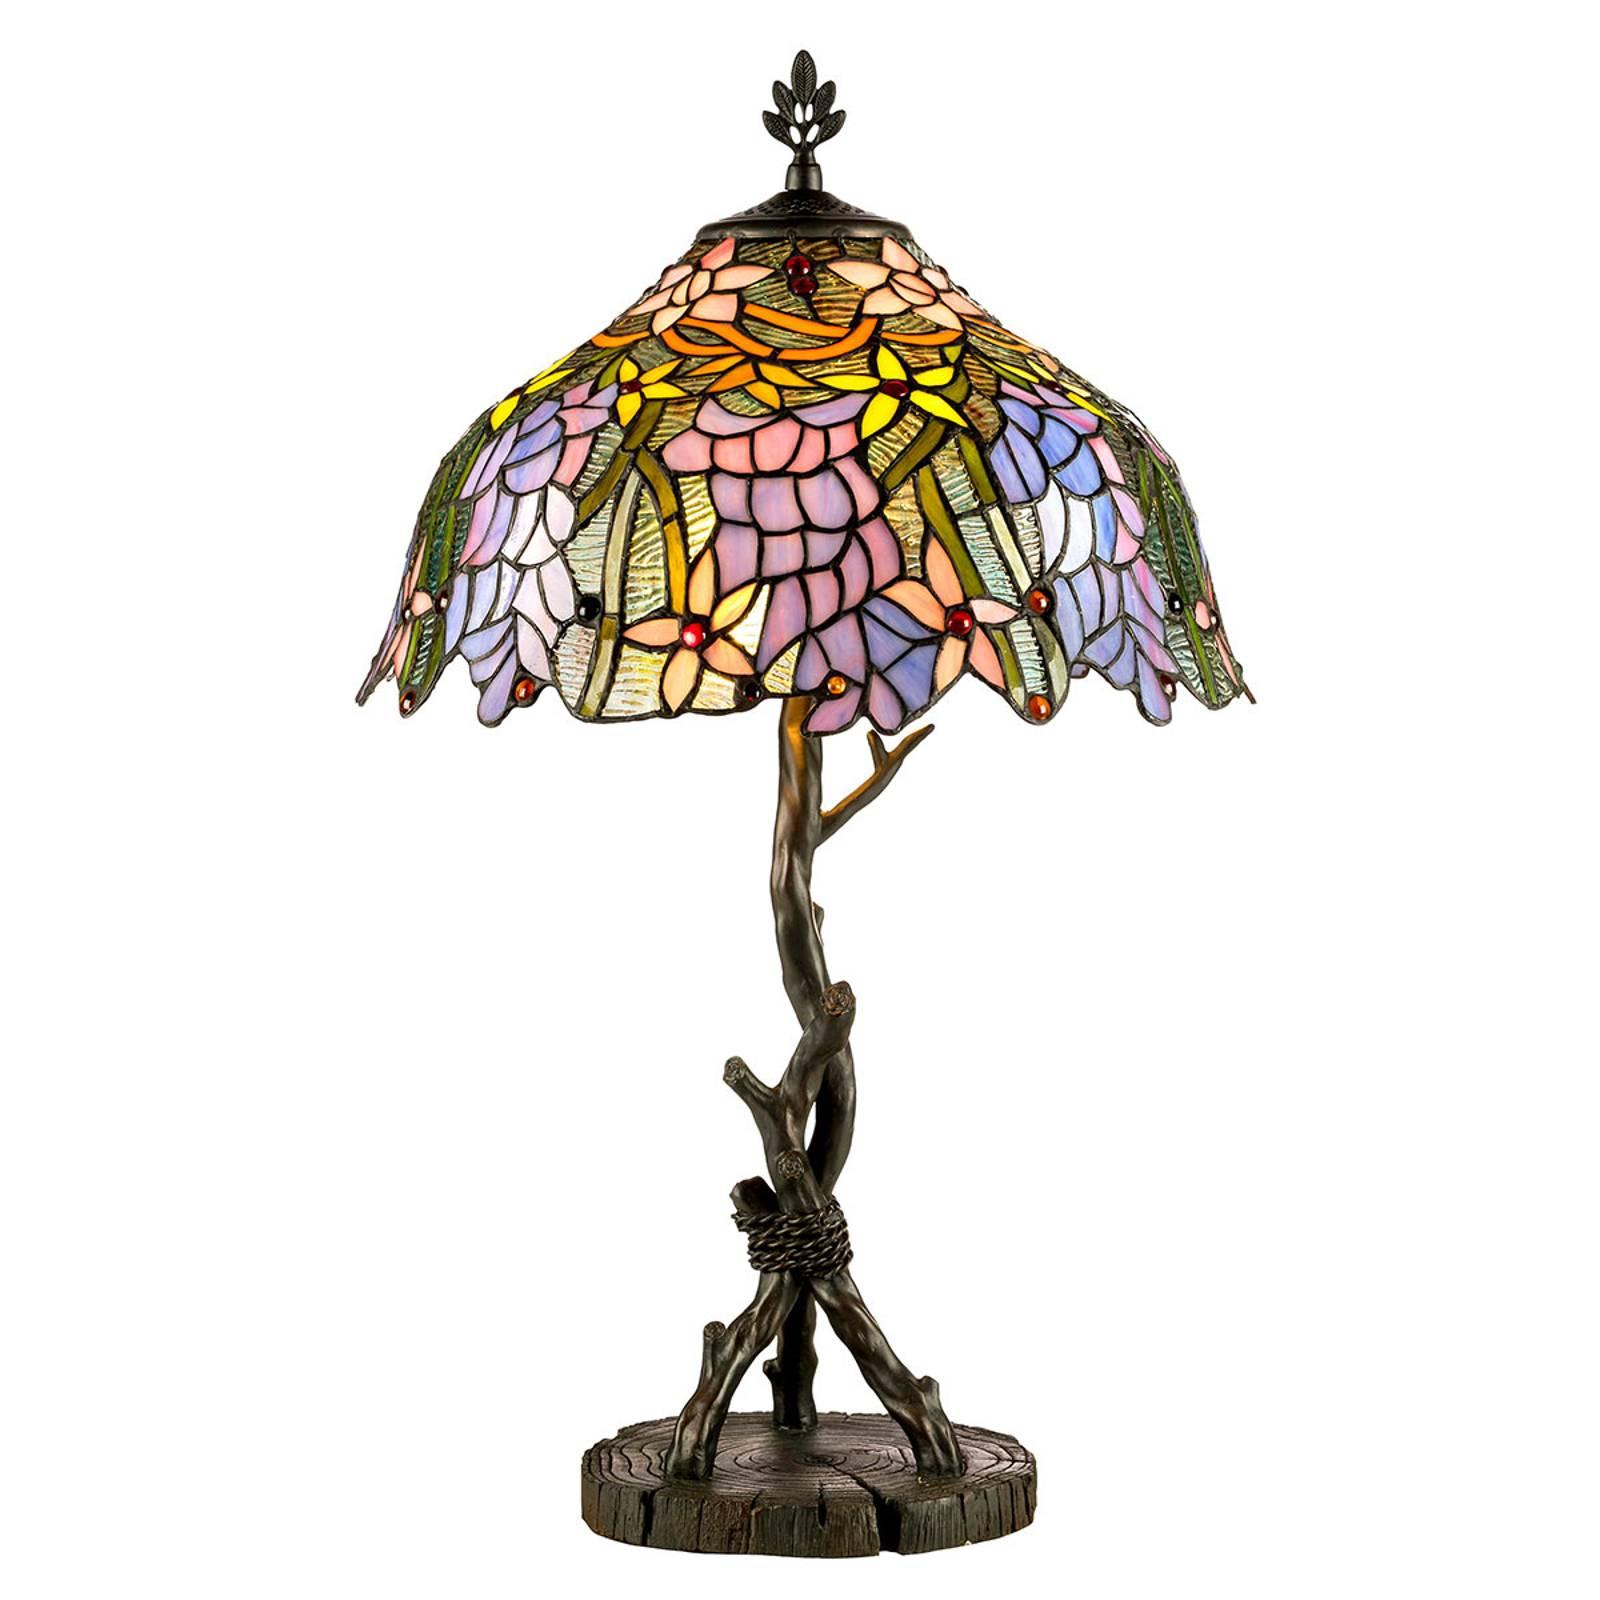 Tafellamp KT1082+AG711P in Tiffany stijl